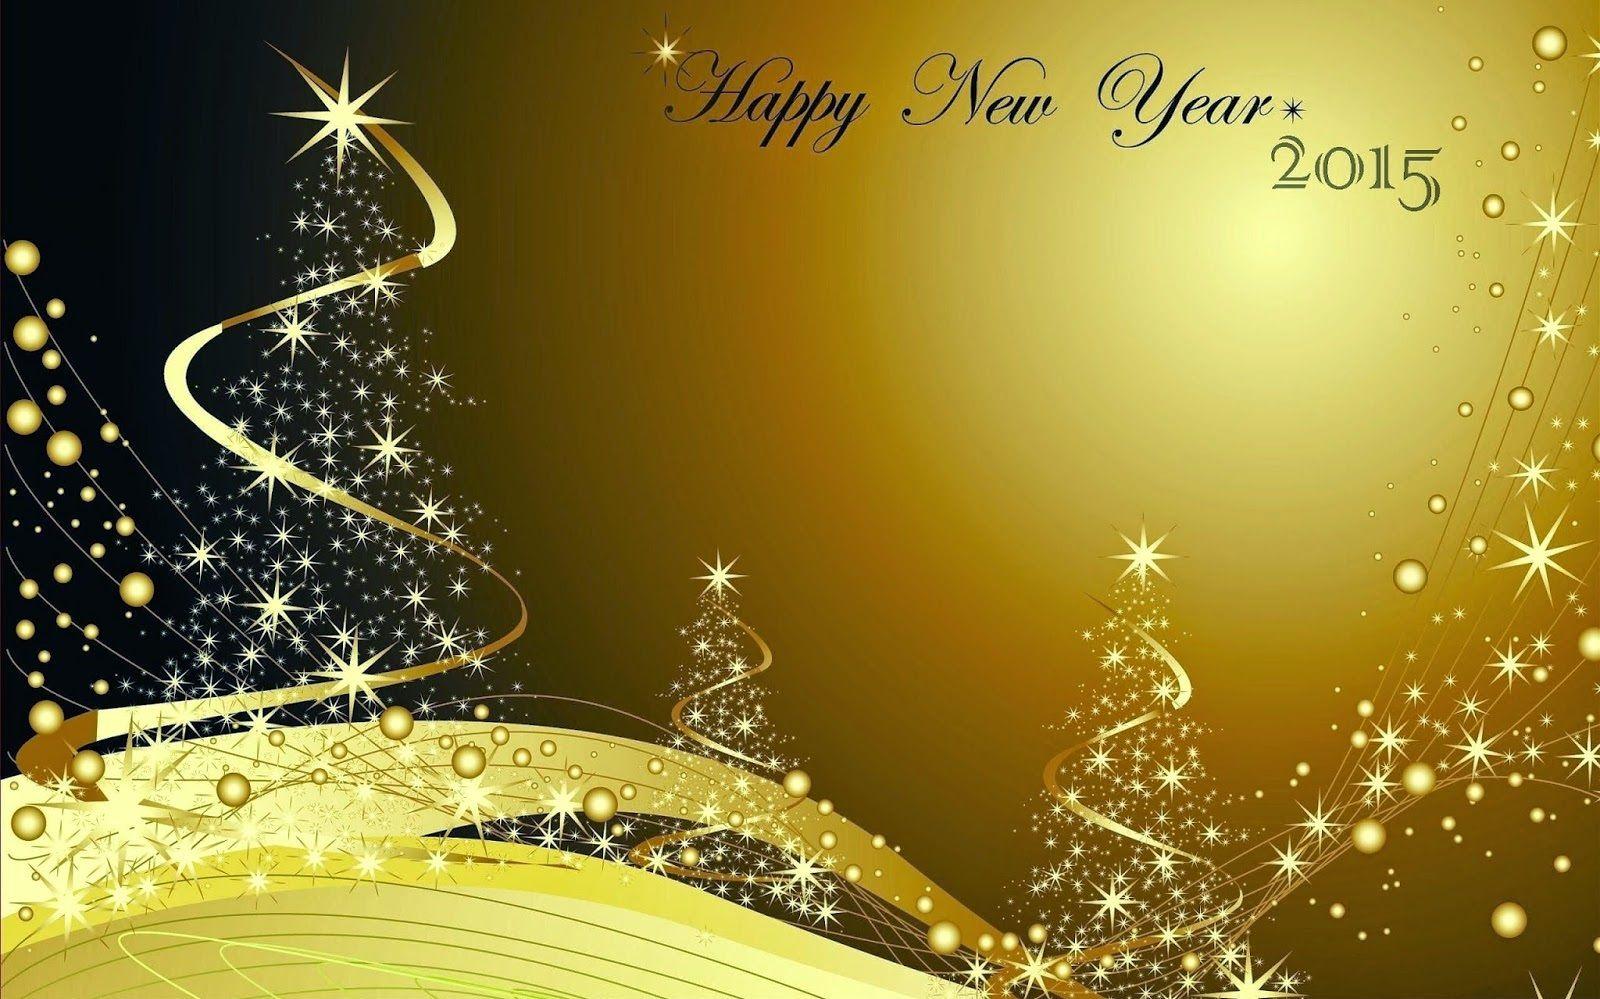 Wallz Hut: Happy New Year Messages Photos | celebrity | Pinterest ...